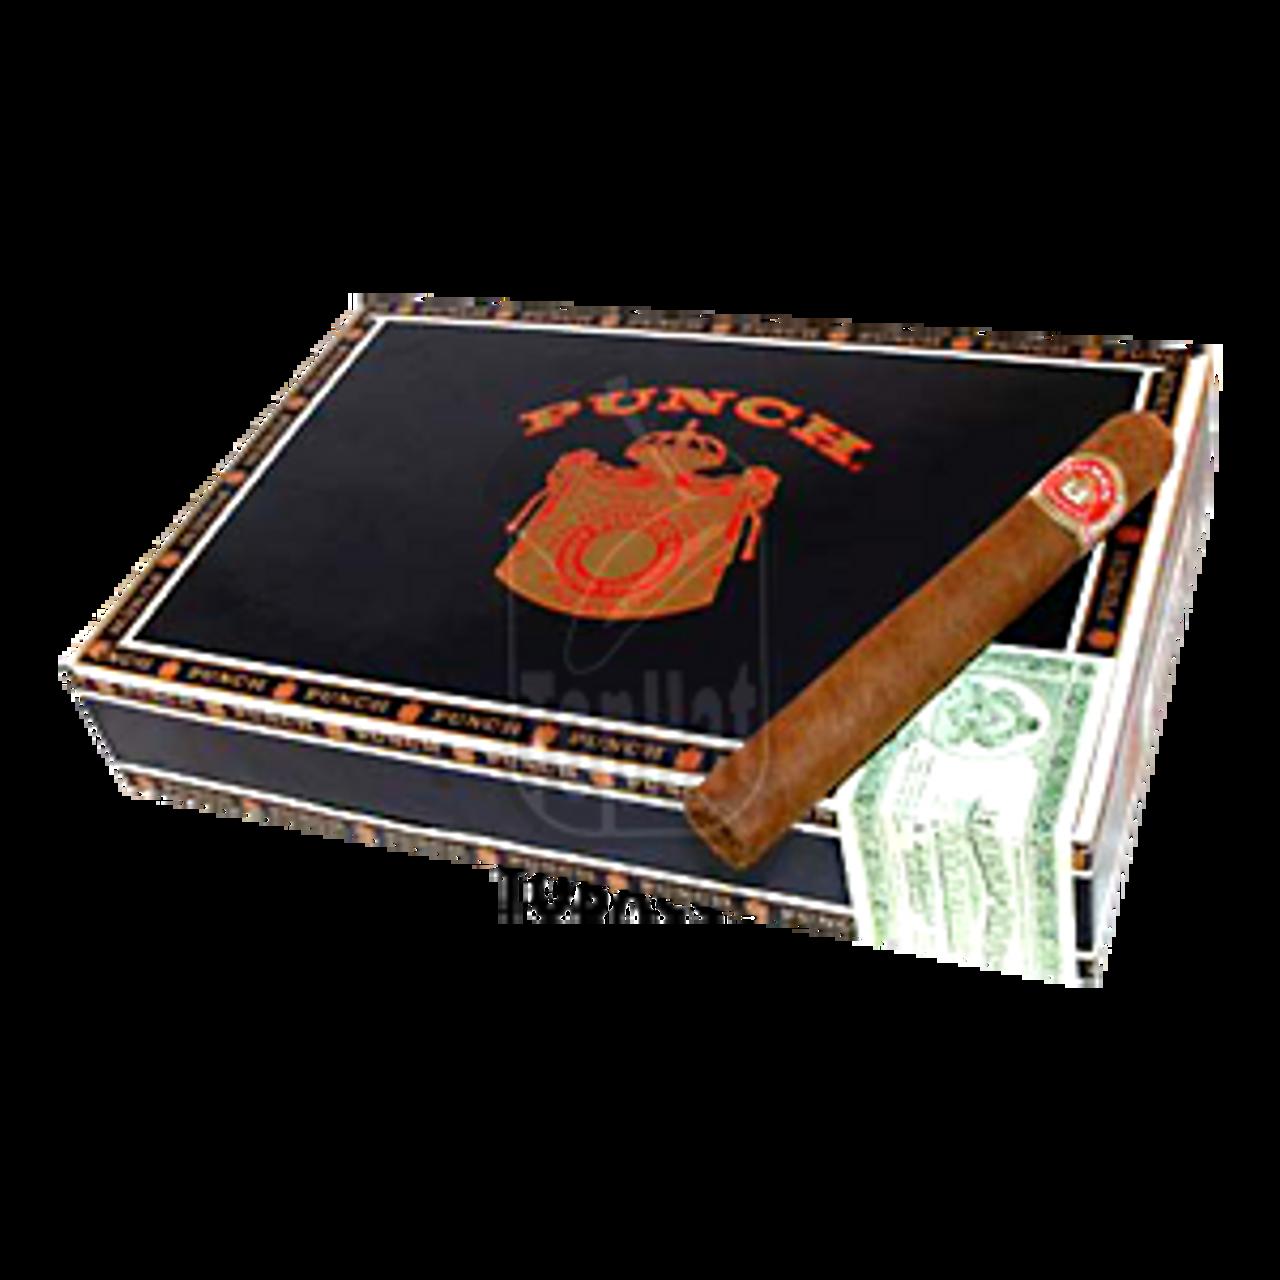 Punch Elites Cigars - 5 1/4  x 45 (Box of 25)